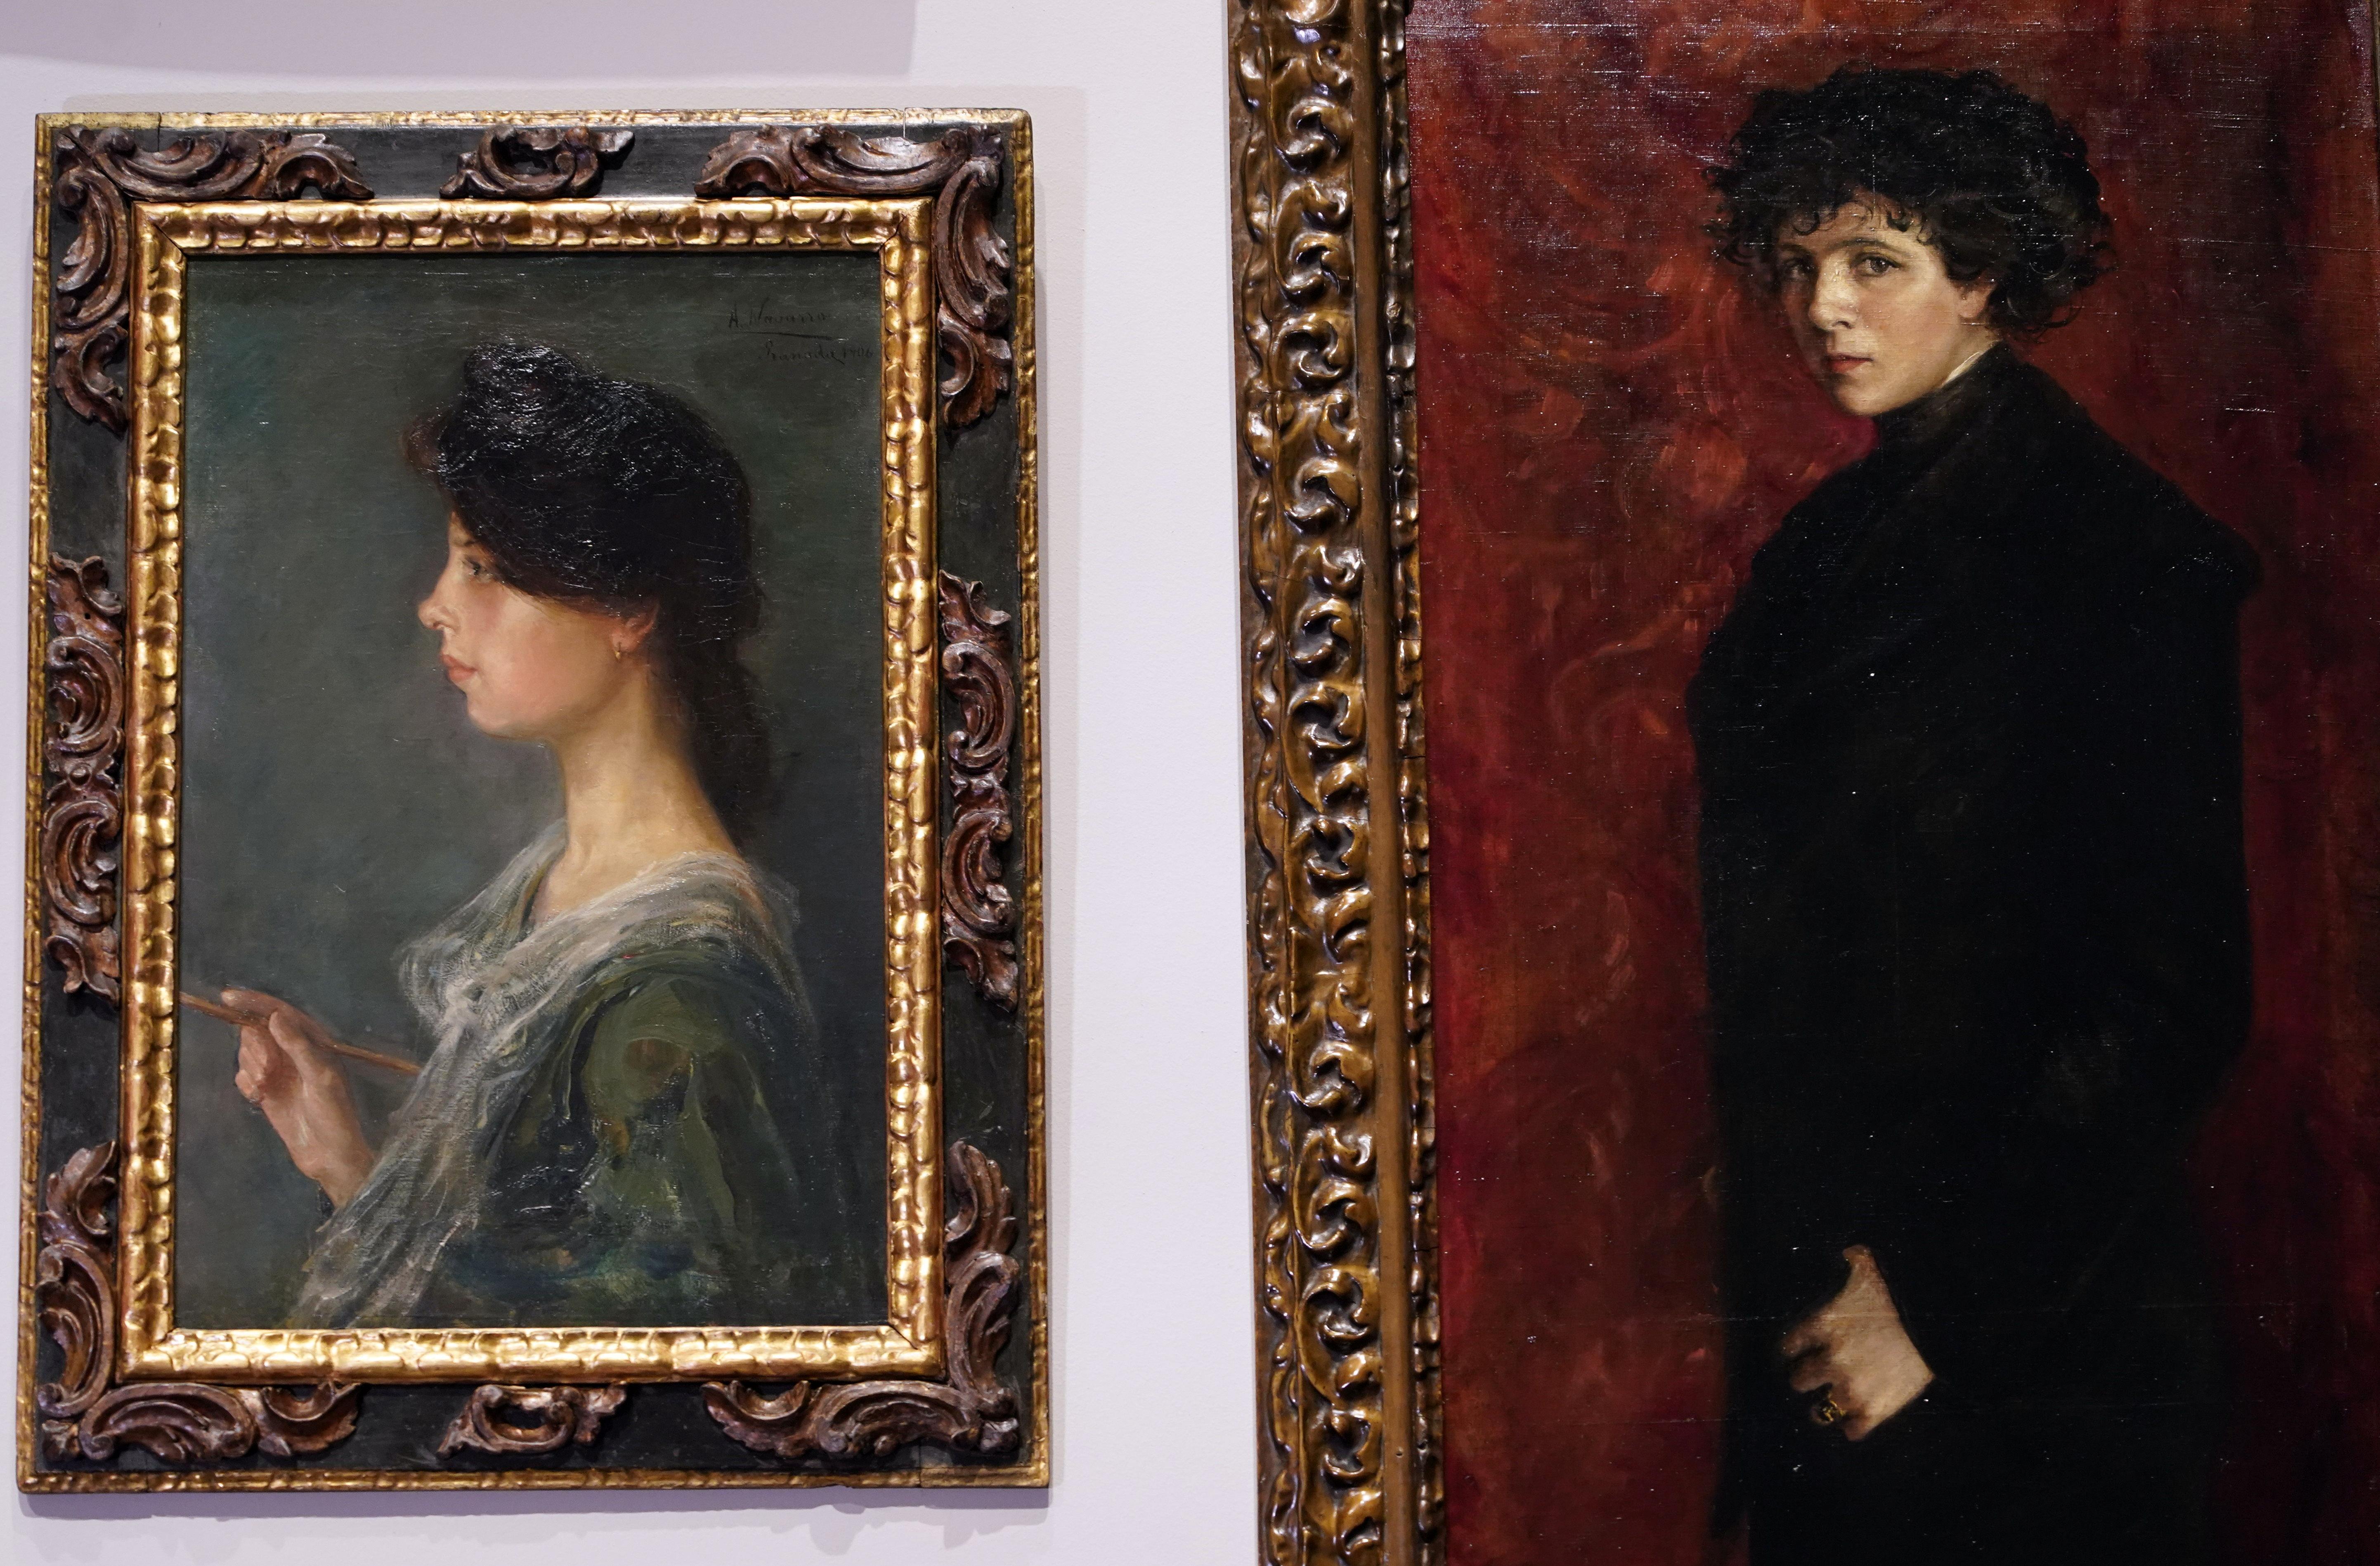 The self-portraits of painters Aurelia Navarro Moreno (L) and Maria Roesset are seen at El Prado Museum in Madrid, Spain July 21, 2021. REUTERS/Juan Medina NO RESALES. NO ARCHIVES